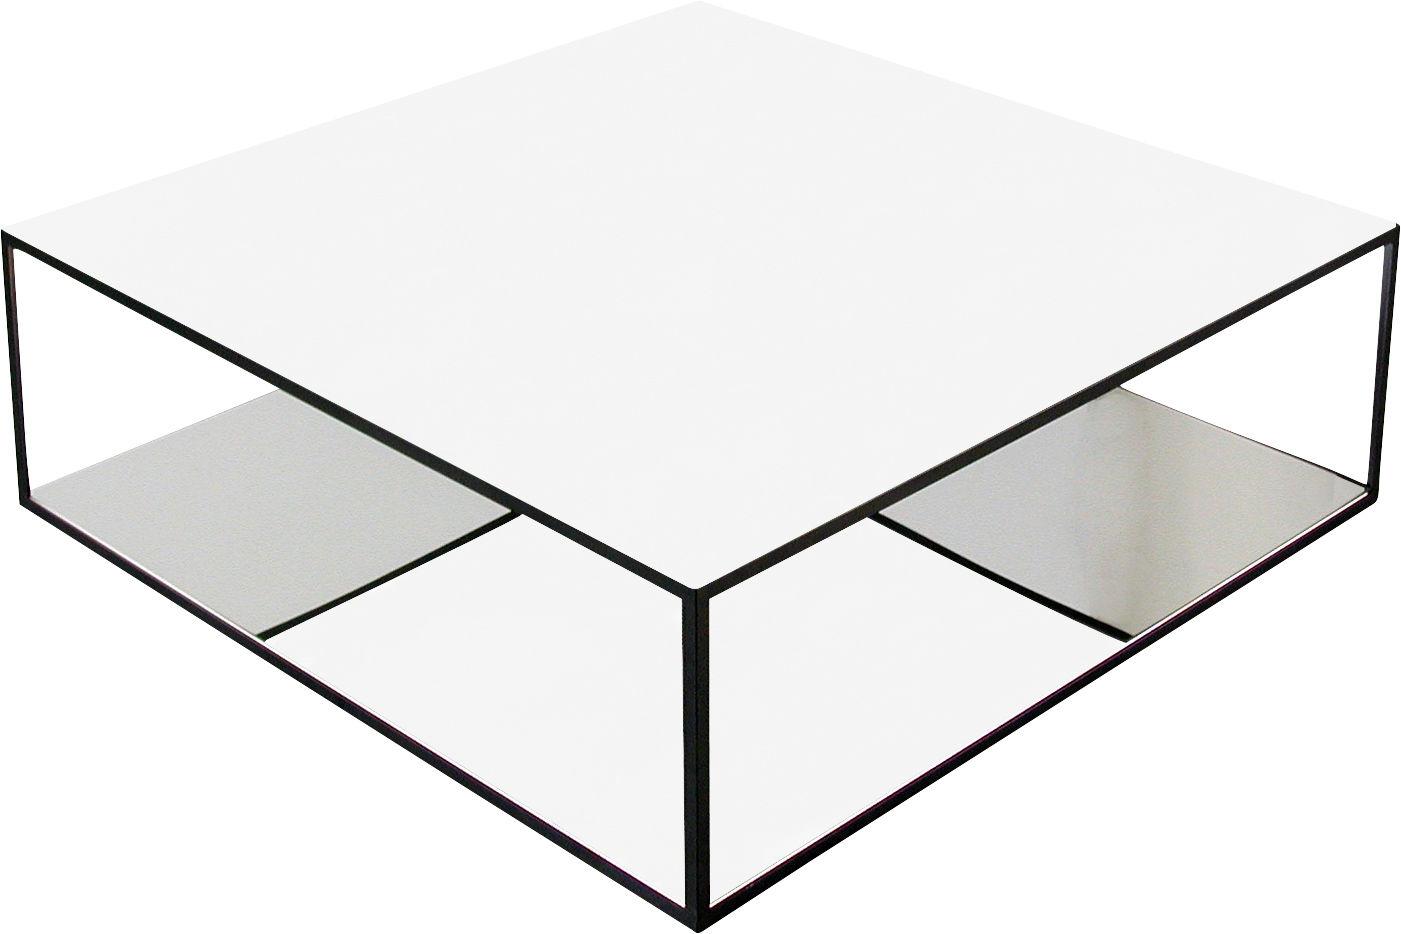 Mobilier - Tables basses - Table basse Double Skin - Zeus - Verre blanc & acier inoxydable poli - Acier peint, Acier poli, Verre laqué